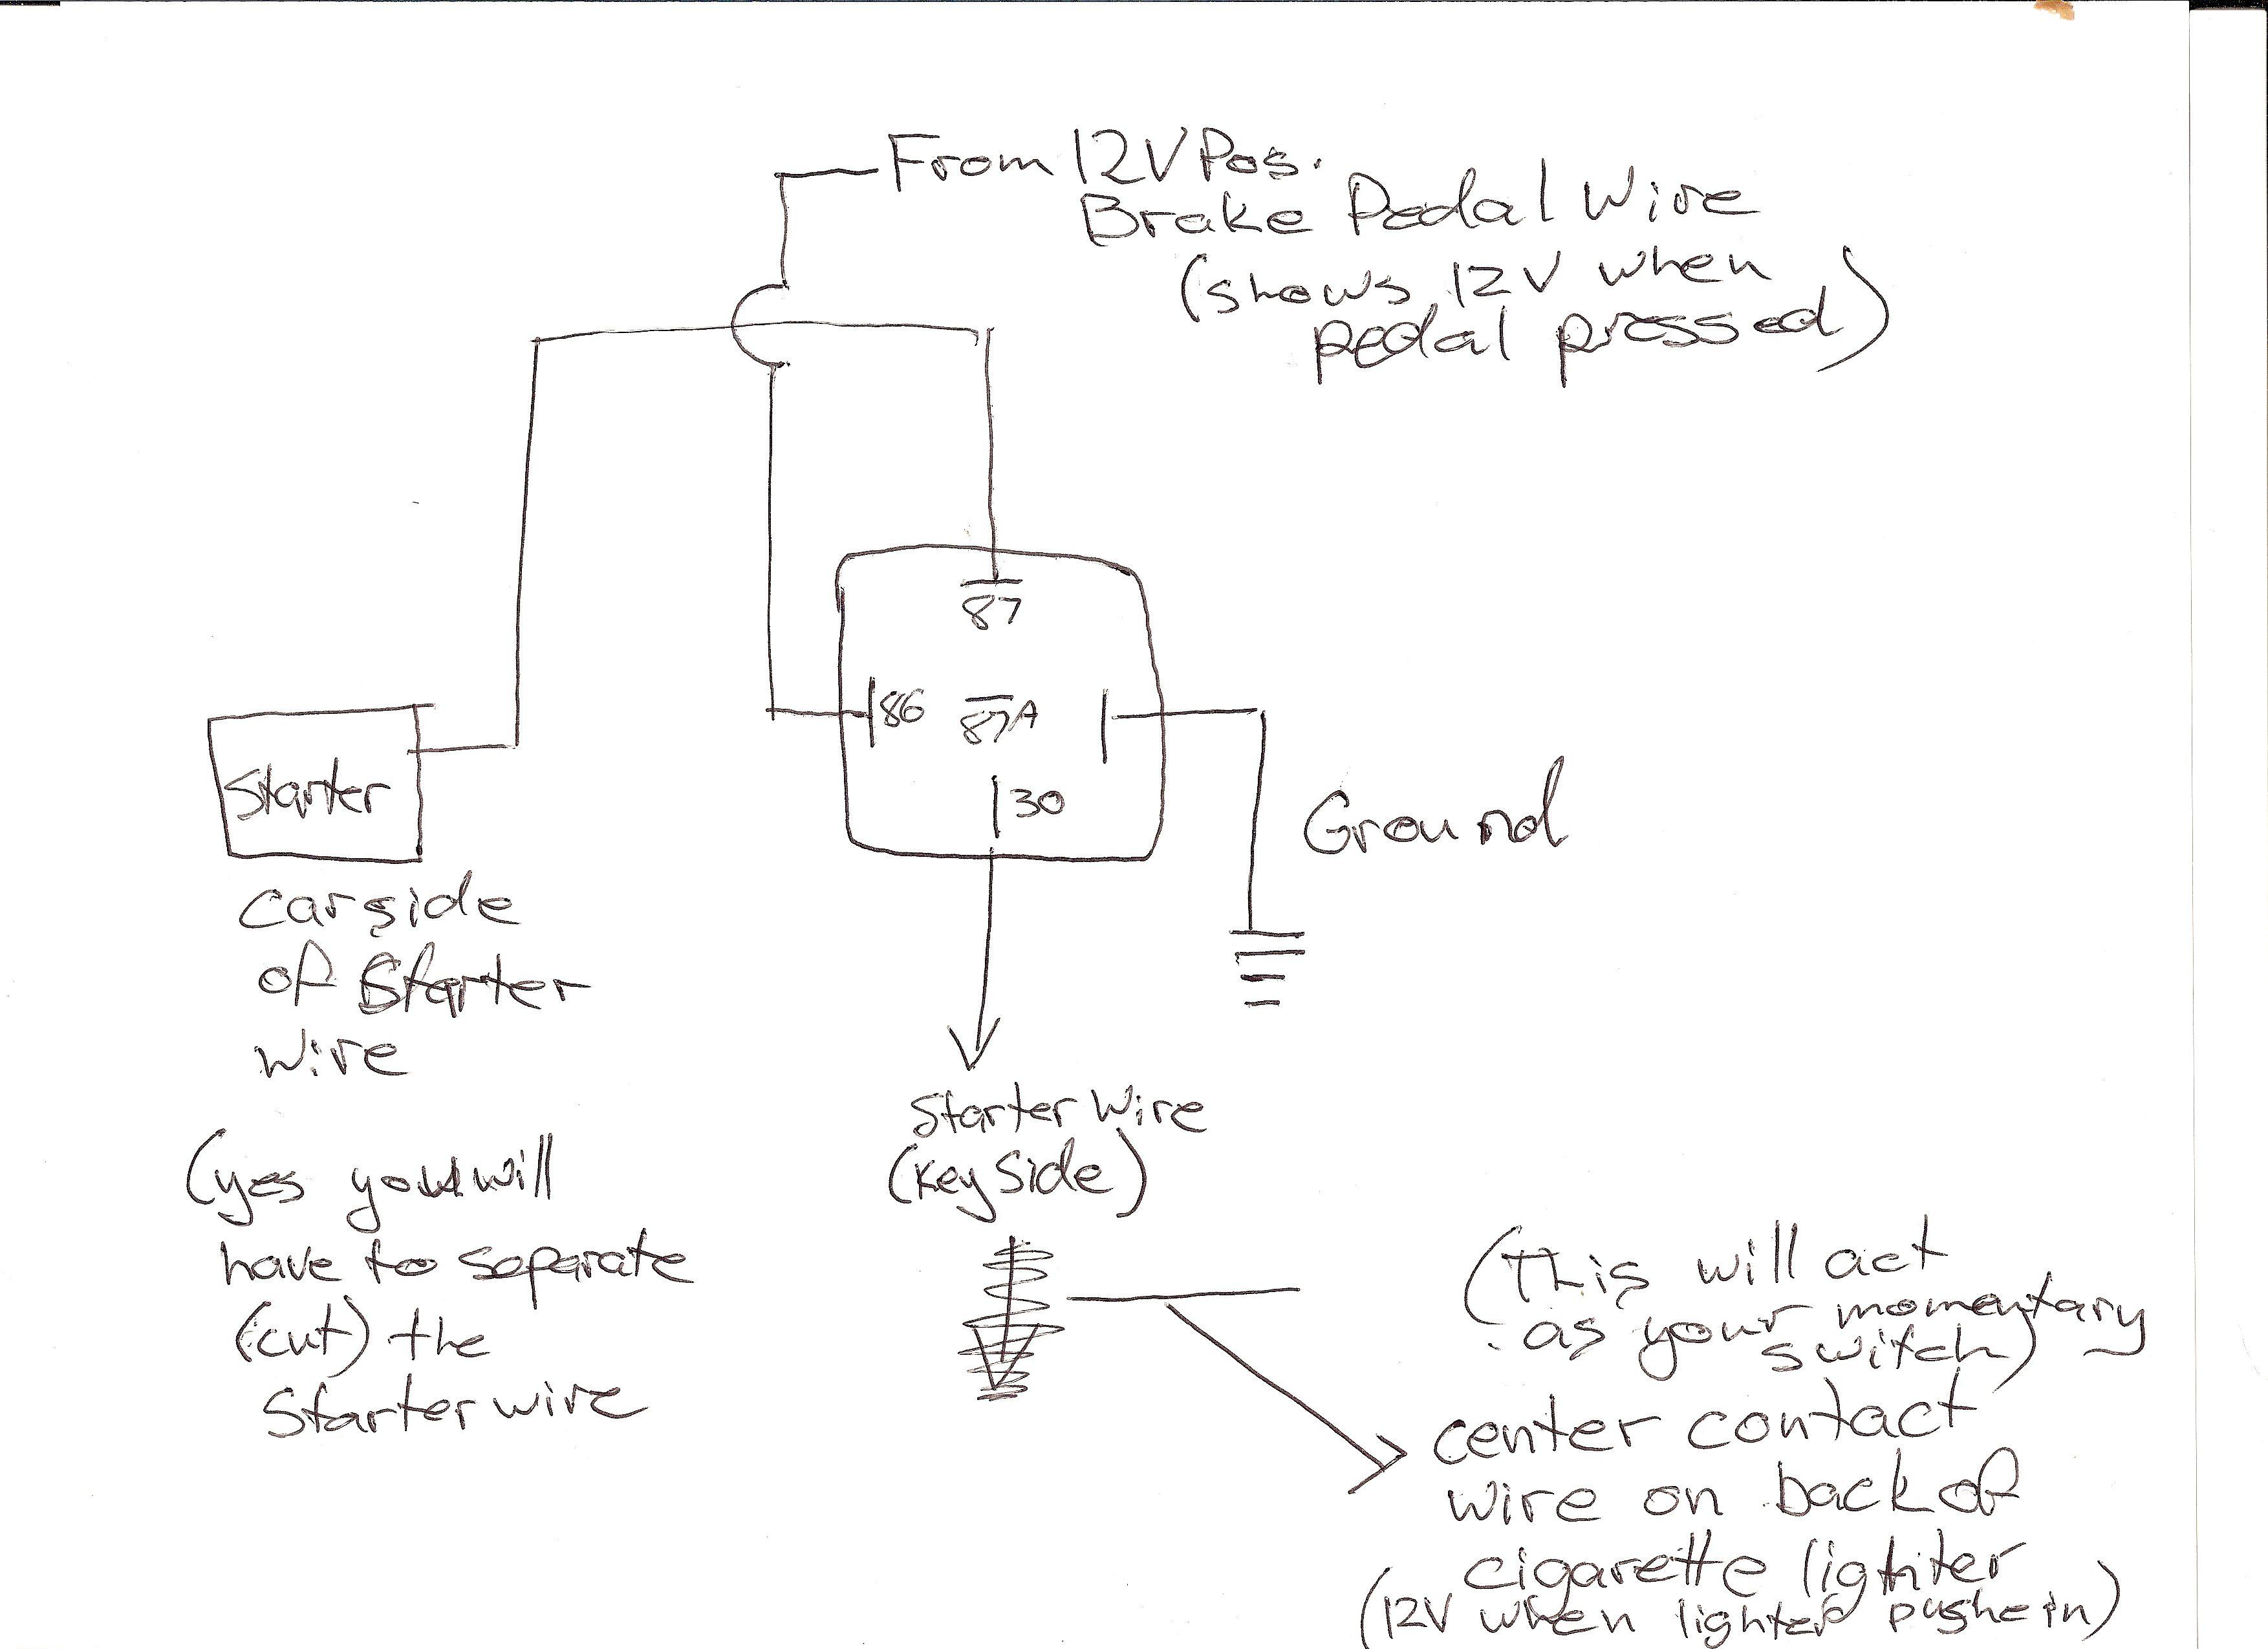 relay rls125 12 vcd wiring diagram